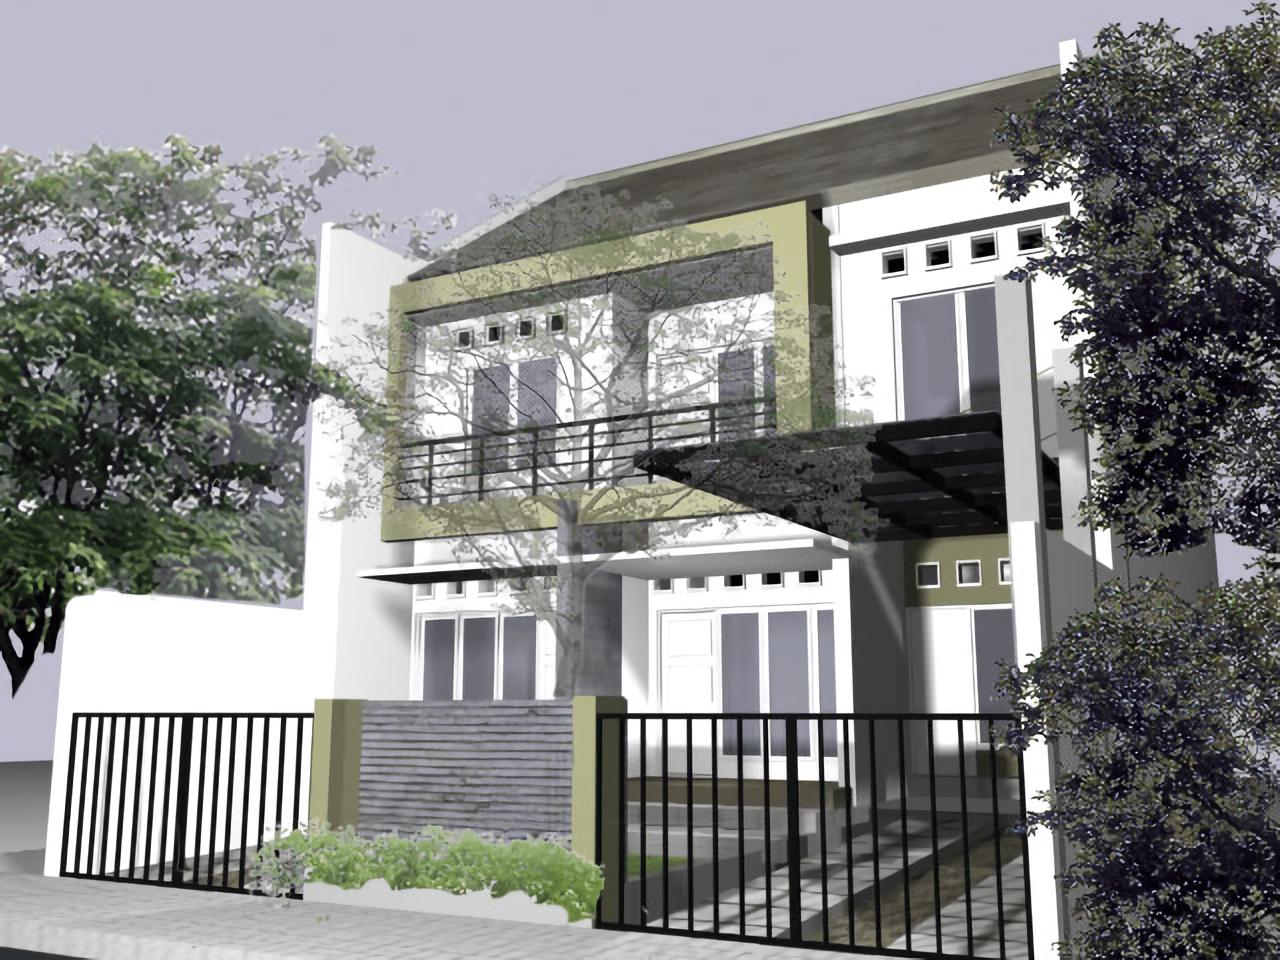 Jasa Design and Build muhammad adi muntaza di Bogor